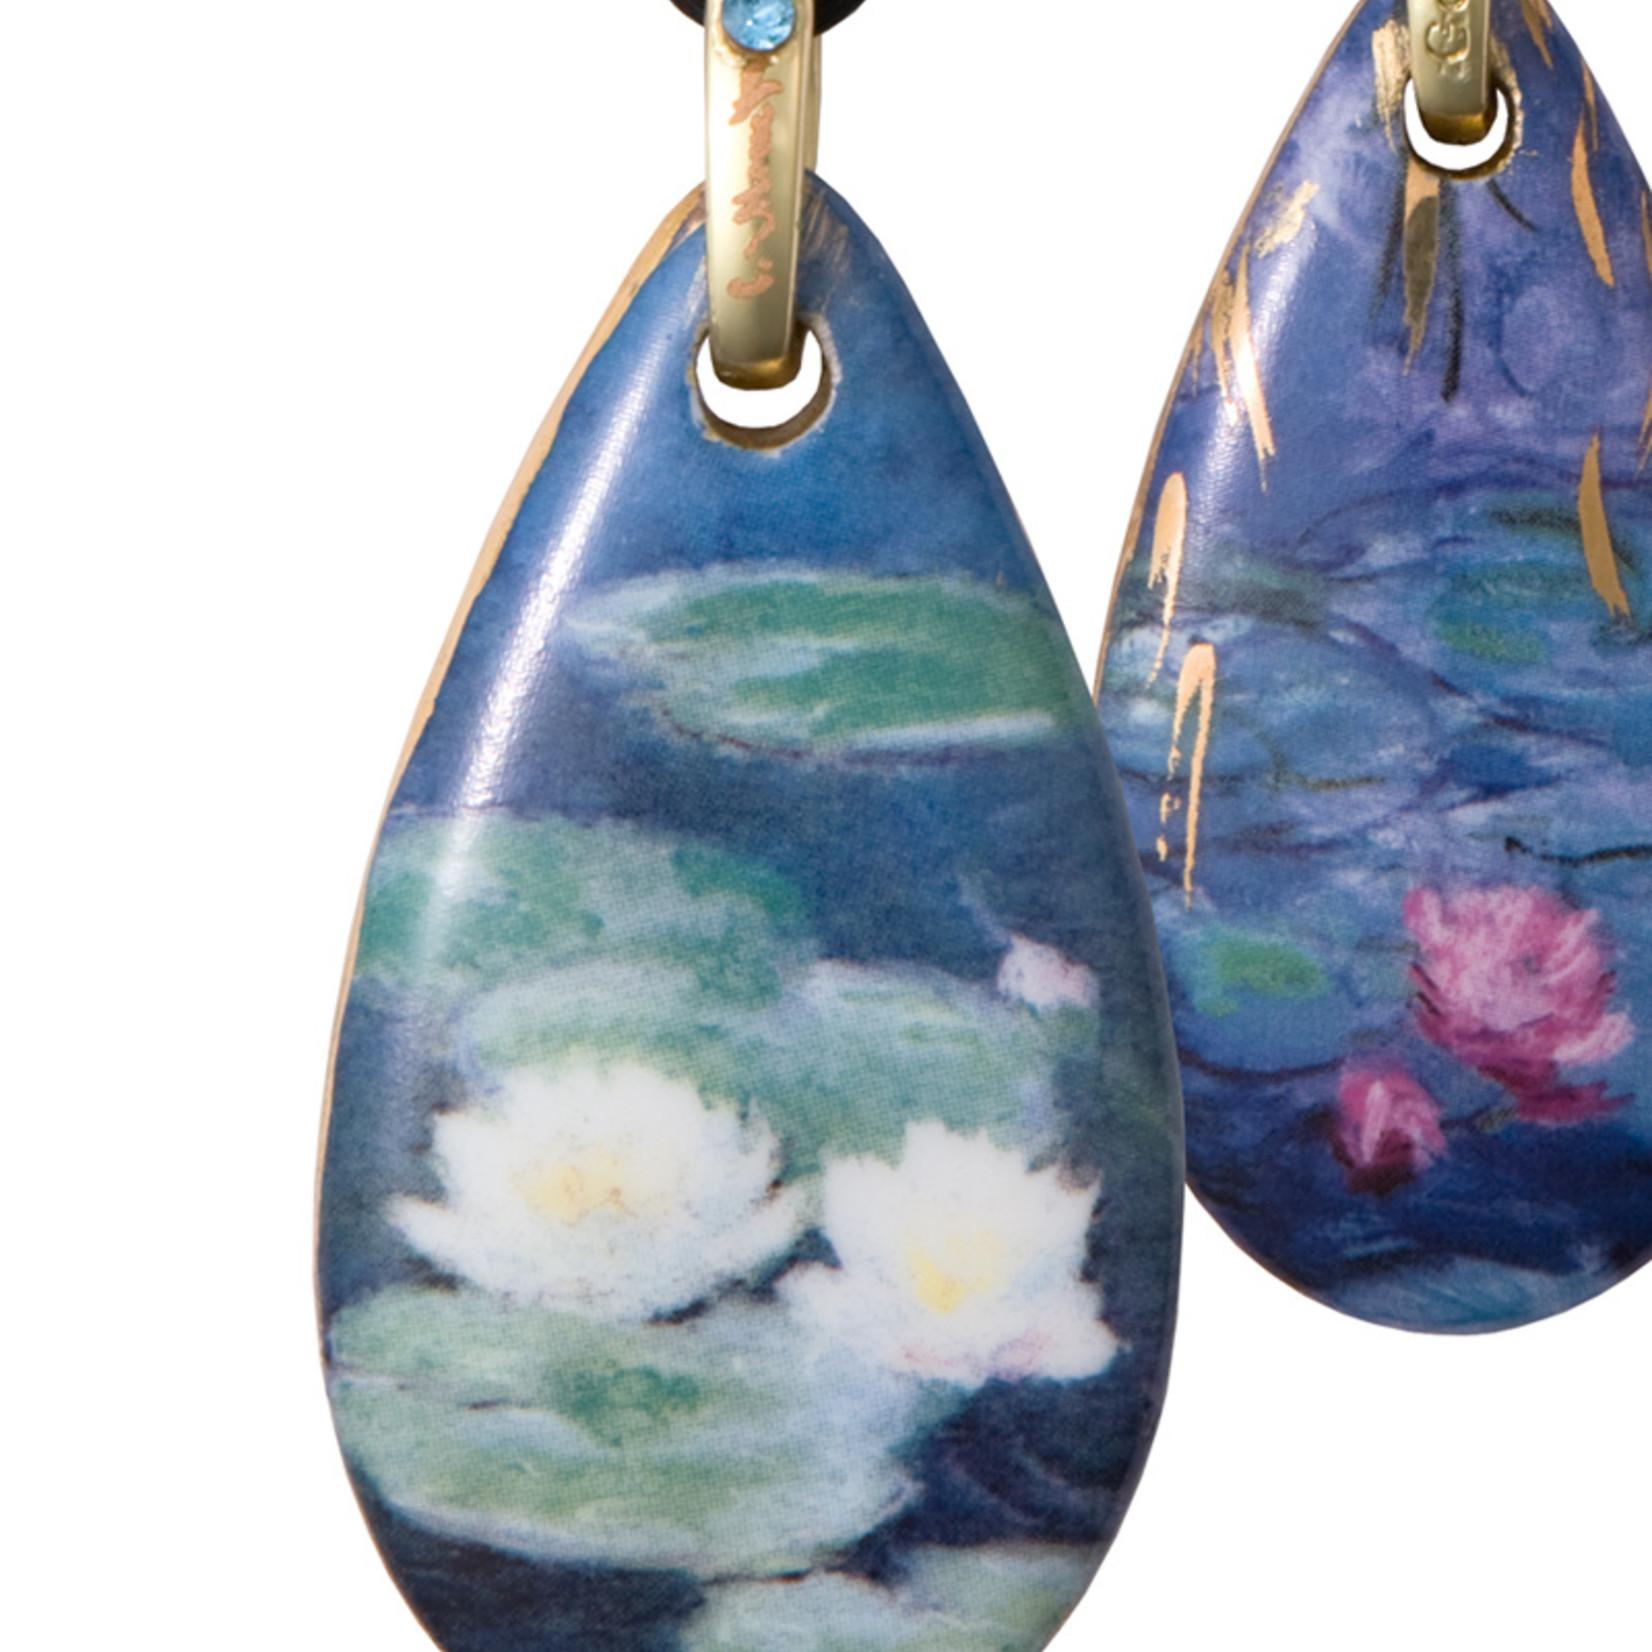 Goebel Porzellanmanufaktur Kette Seerosen am Abend I Claude Monet I Goebel Porzellan